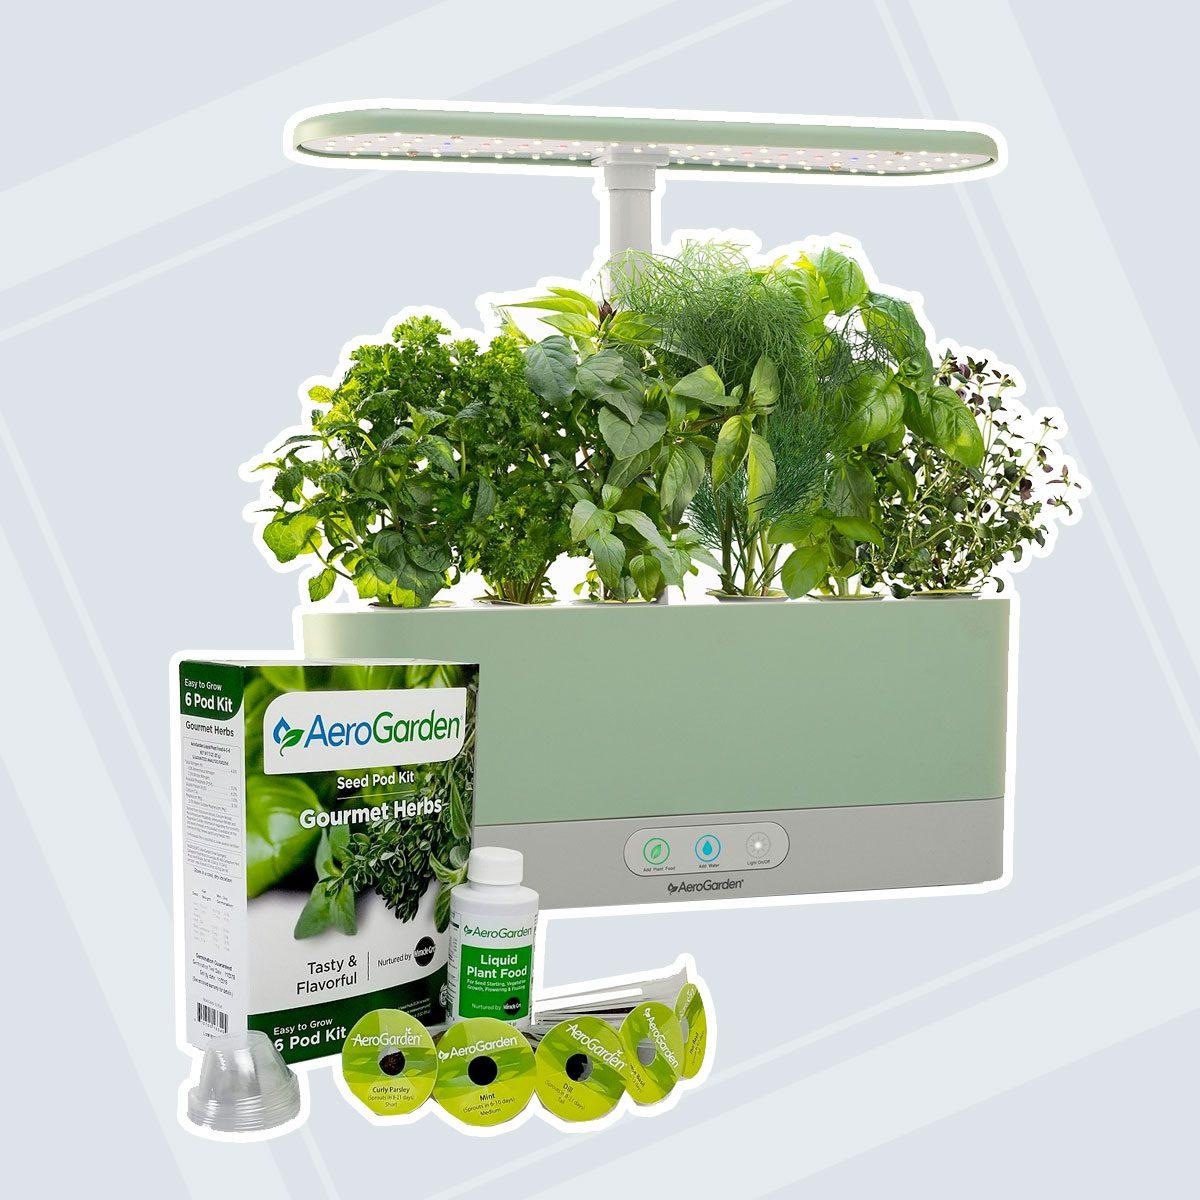 Harvest Slim with Gourmet Herbs Seed Pod Kit